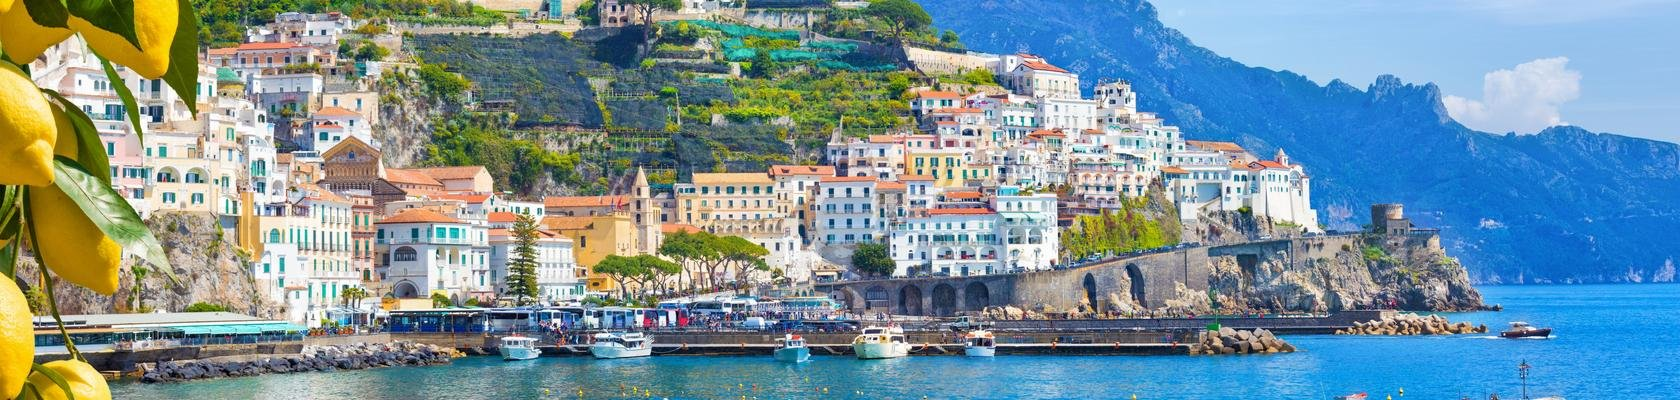 Amalfi aan de Amalfikust